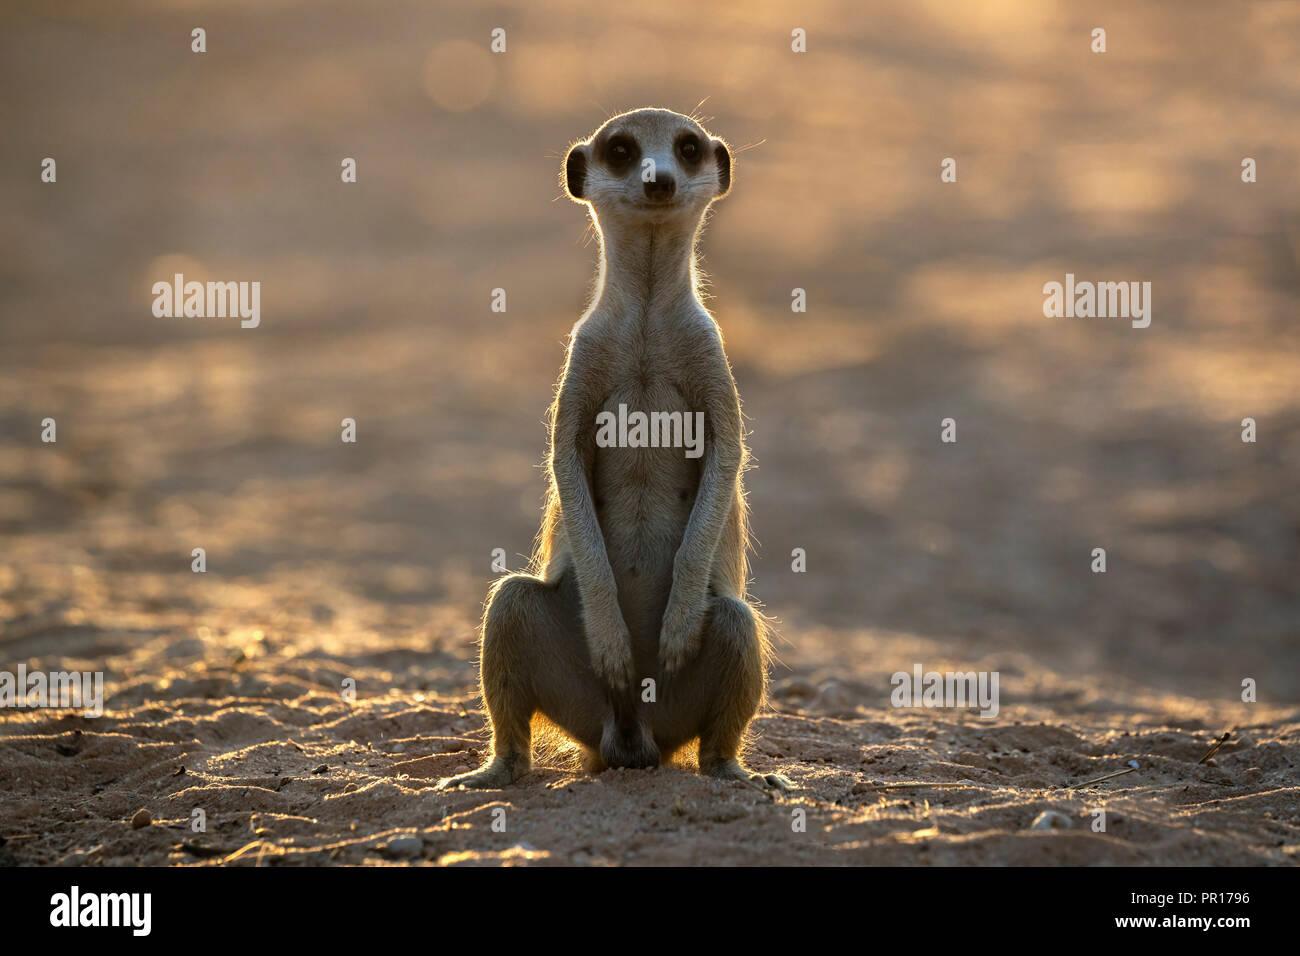 Meerkat (Suricata suricatta), Kgalagadi Transfrontier Park, South Africa, Africa - Stock Image